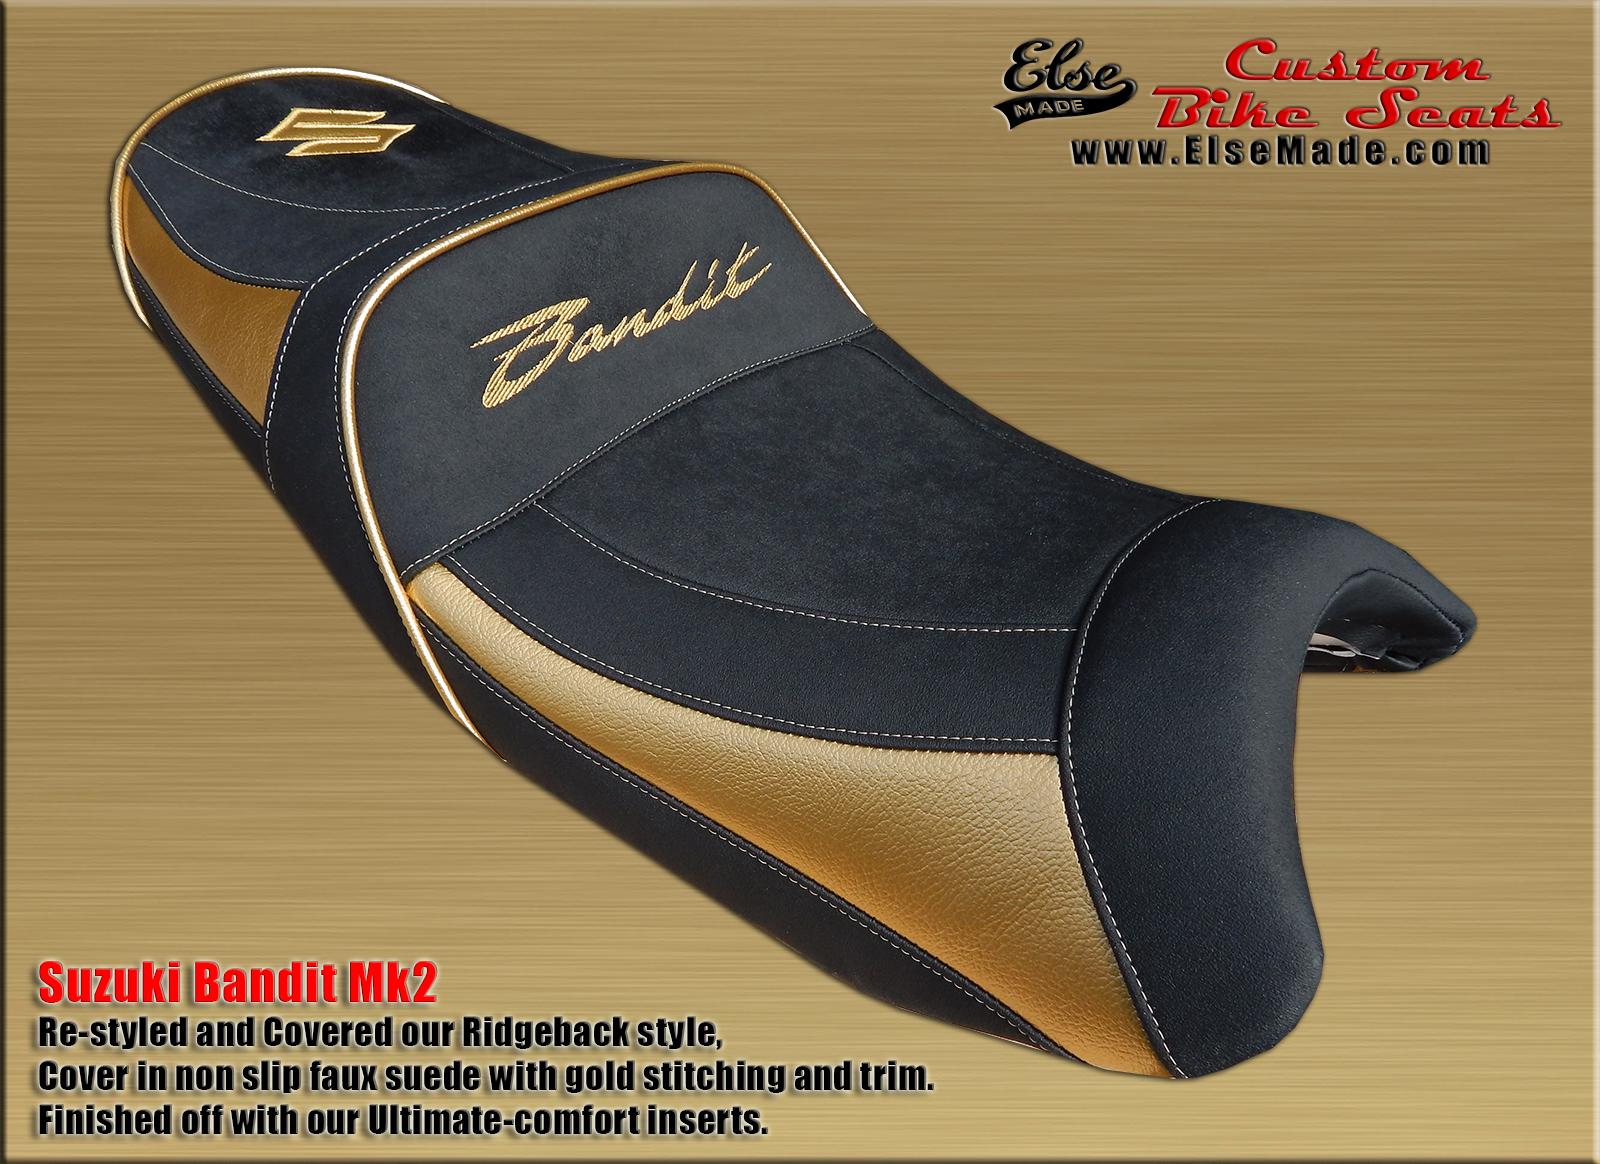 bandit mk2 ridgeback fs.jpg